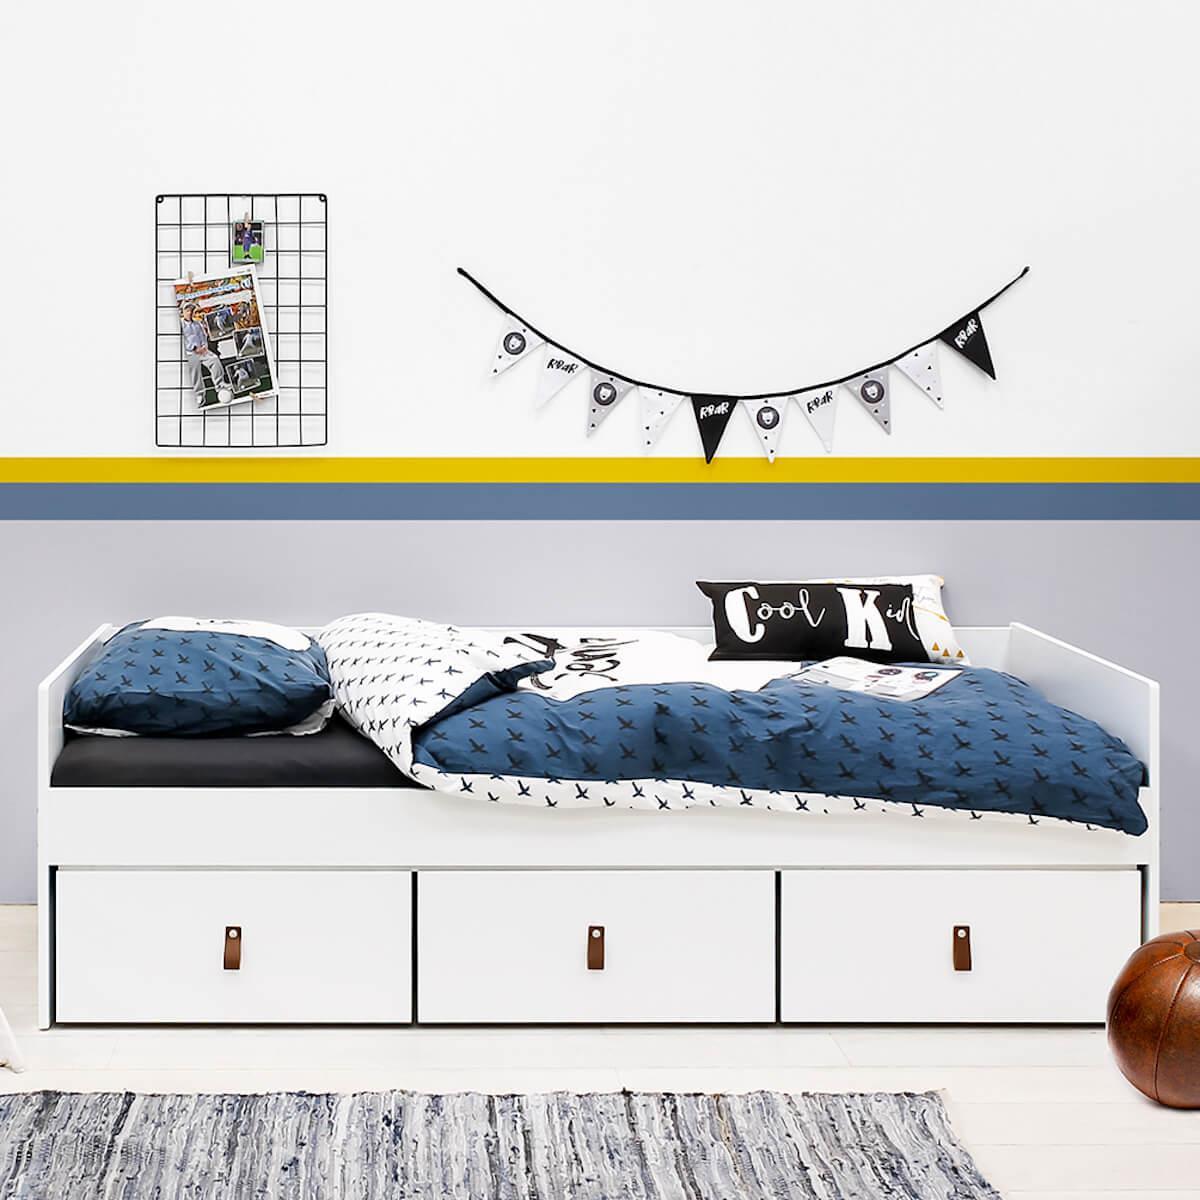 Cama-sofá 90x200cm 3 cajones INDY Bopita blanco-natural